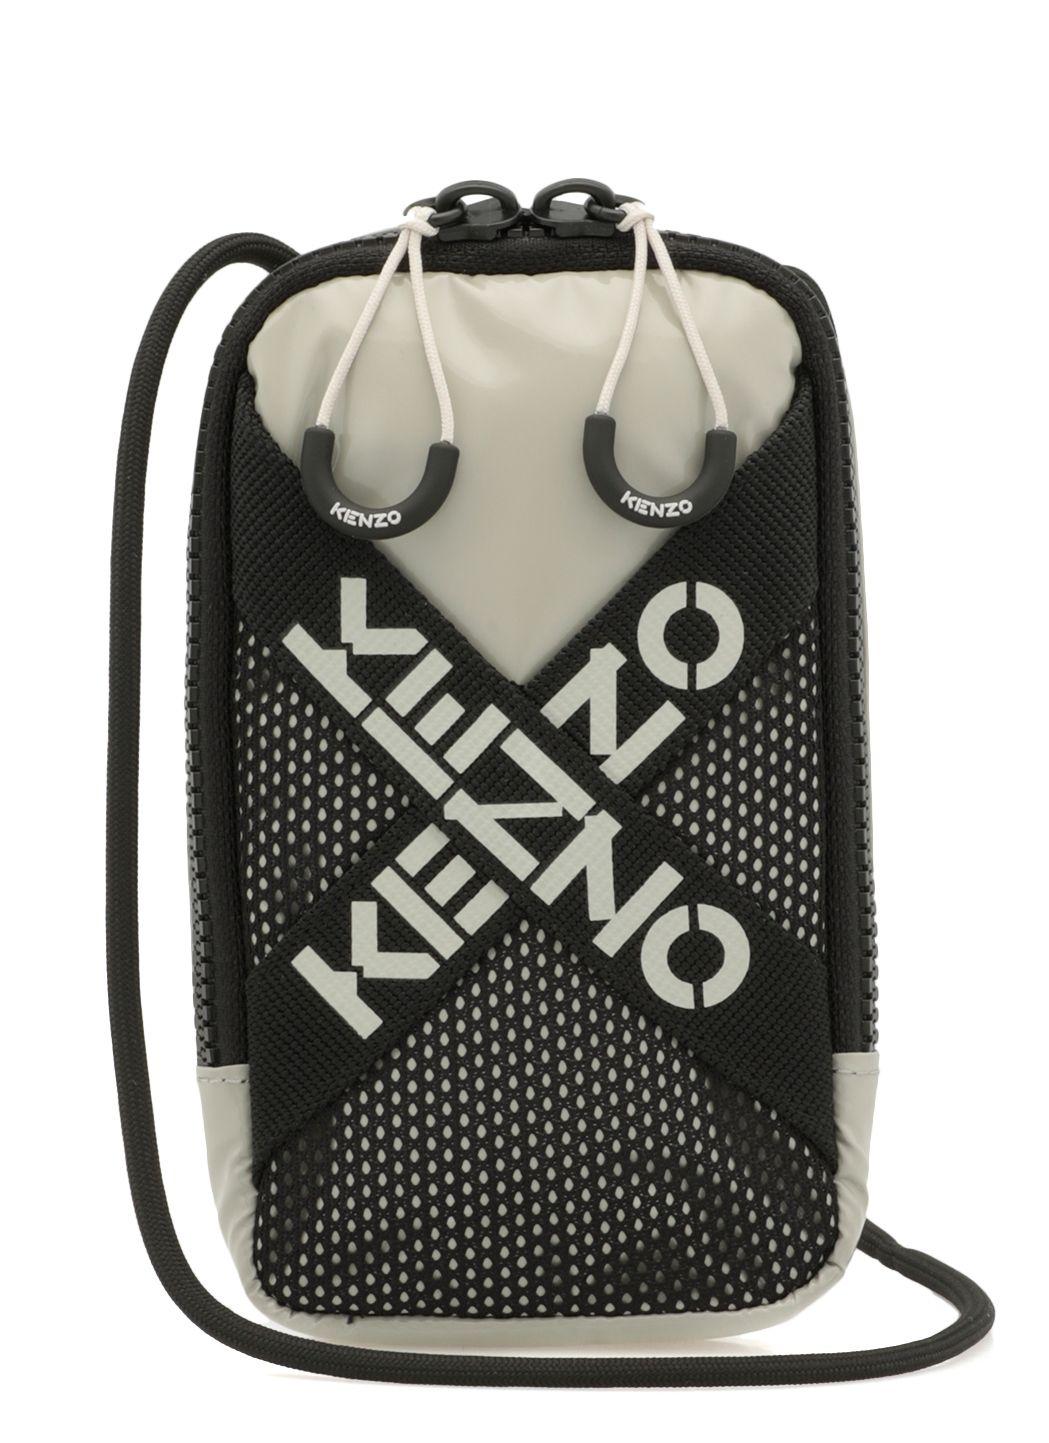 Sport phone holder